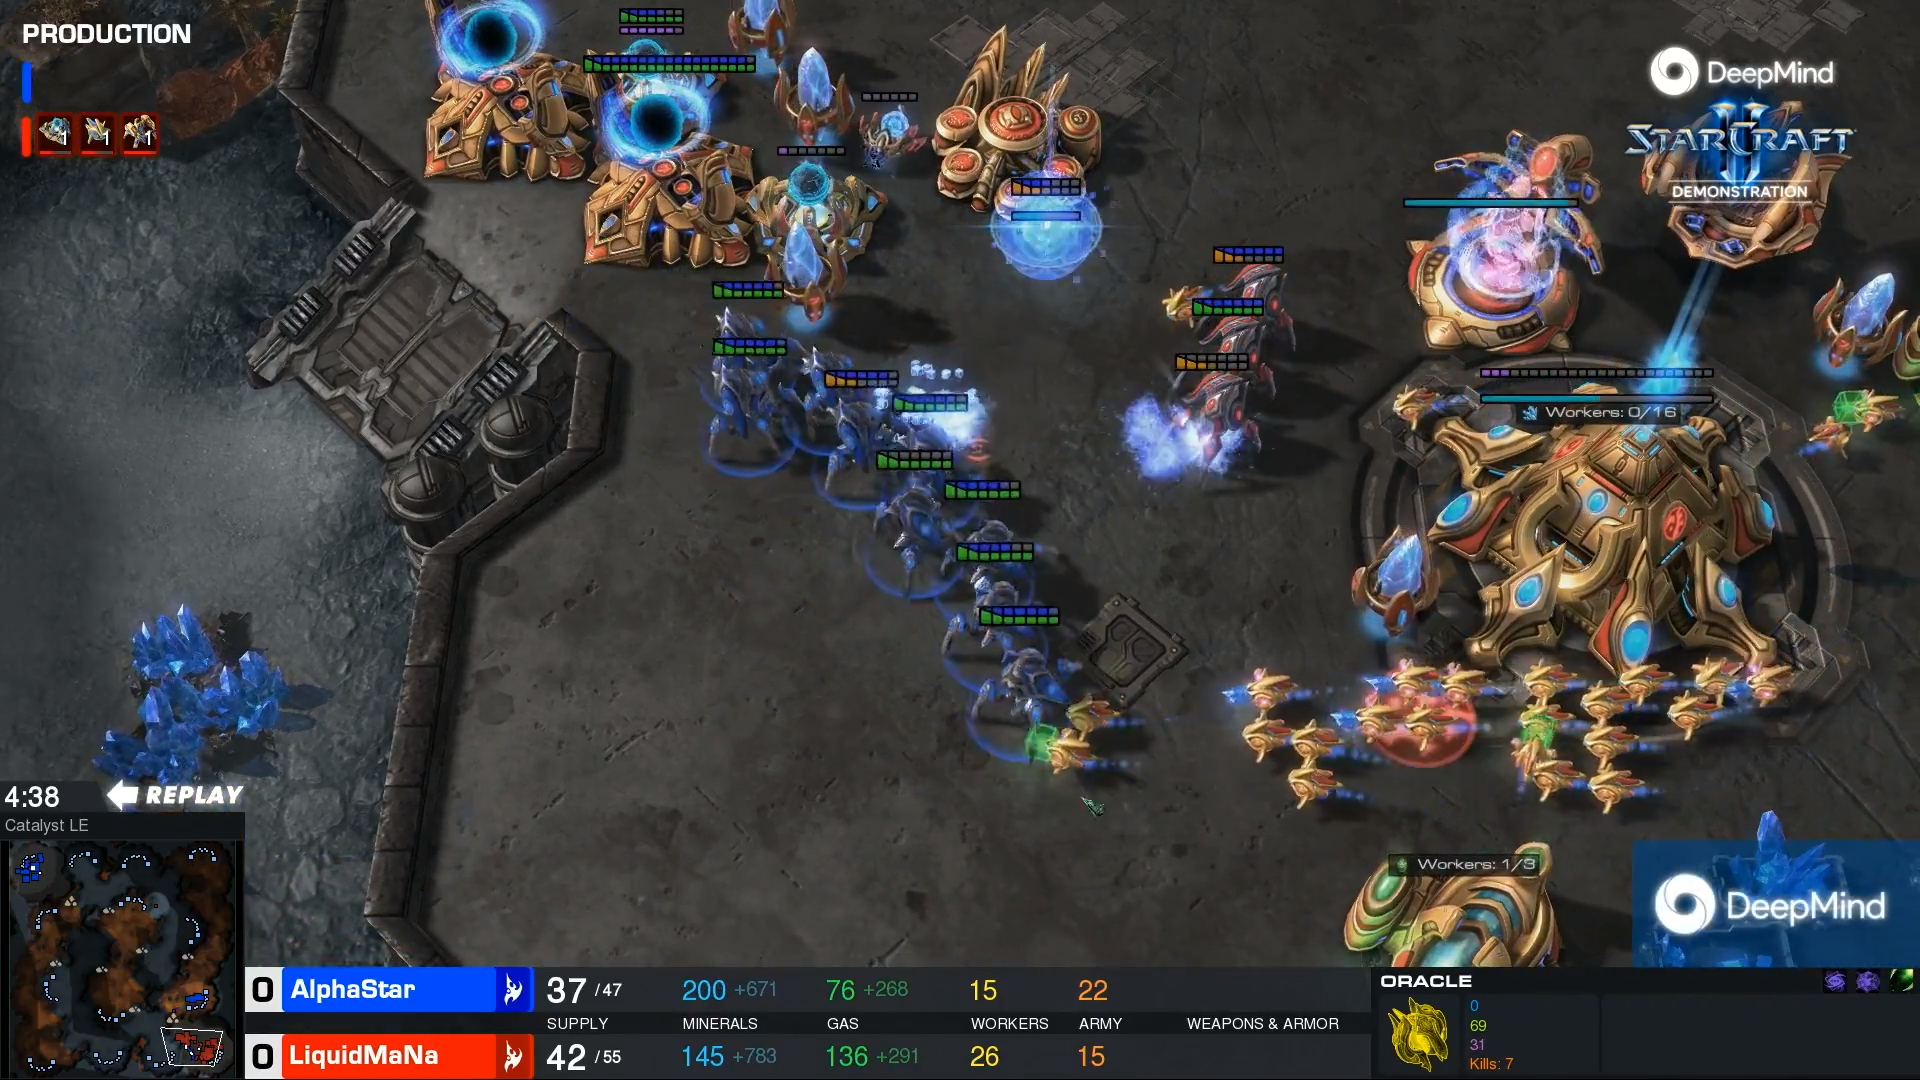 DeepMind's AlphaStar AI is one of the world's best StarCraft